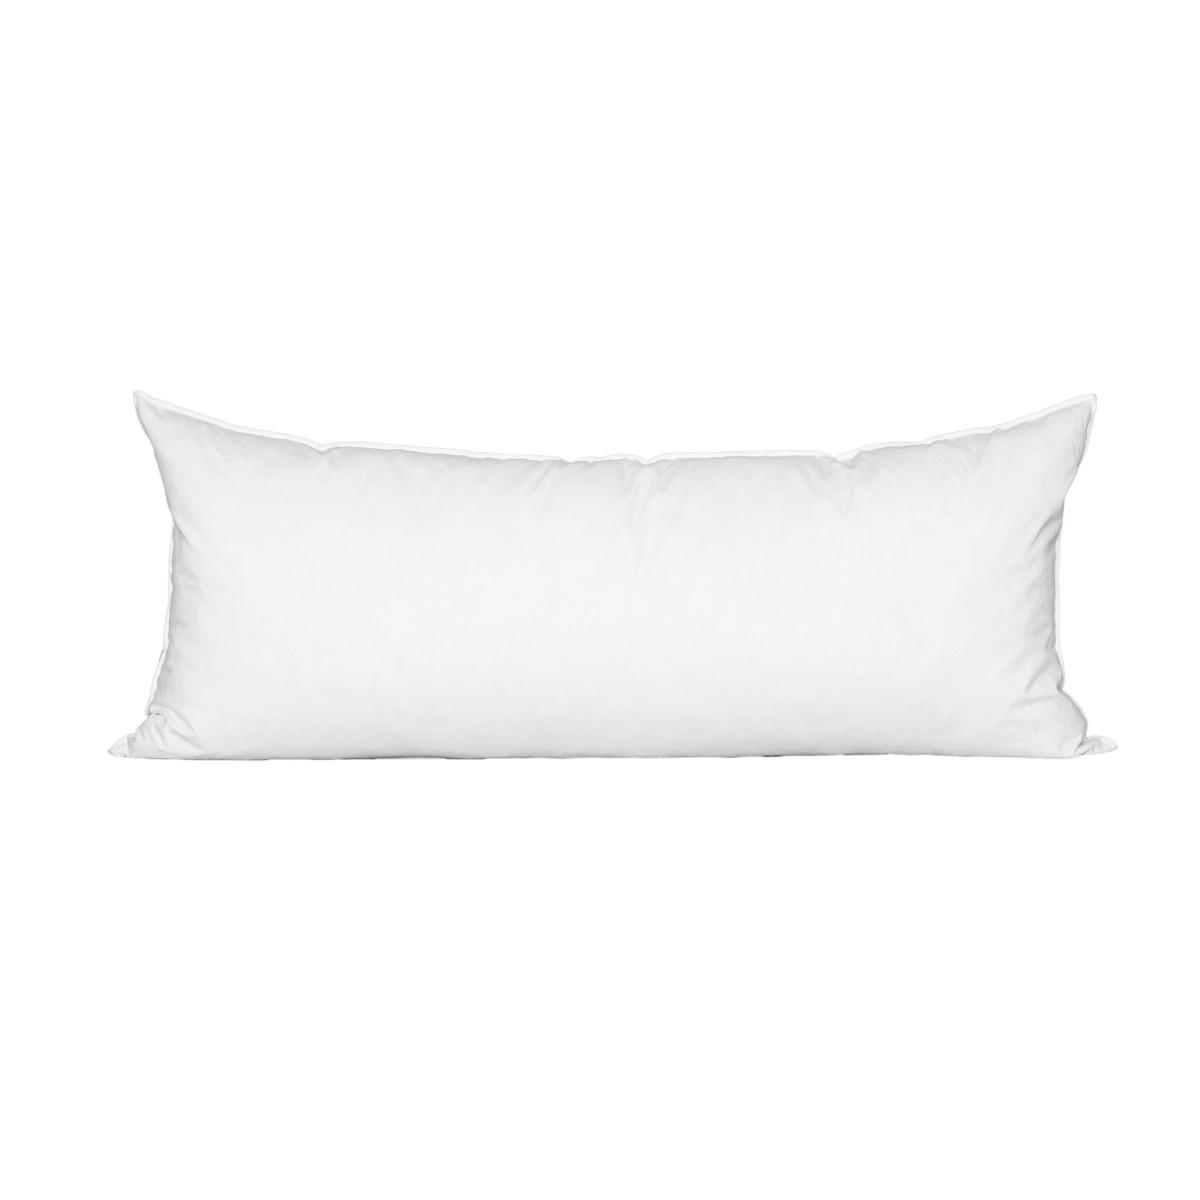 15 x 30 Lumbar Feather Down Pillow Insert - Made in USA